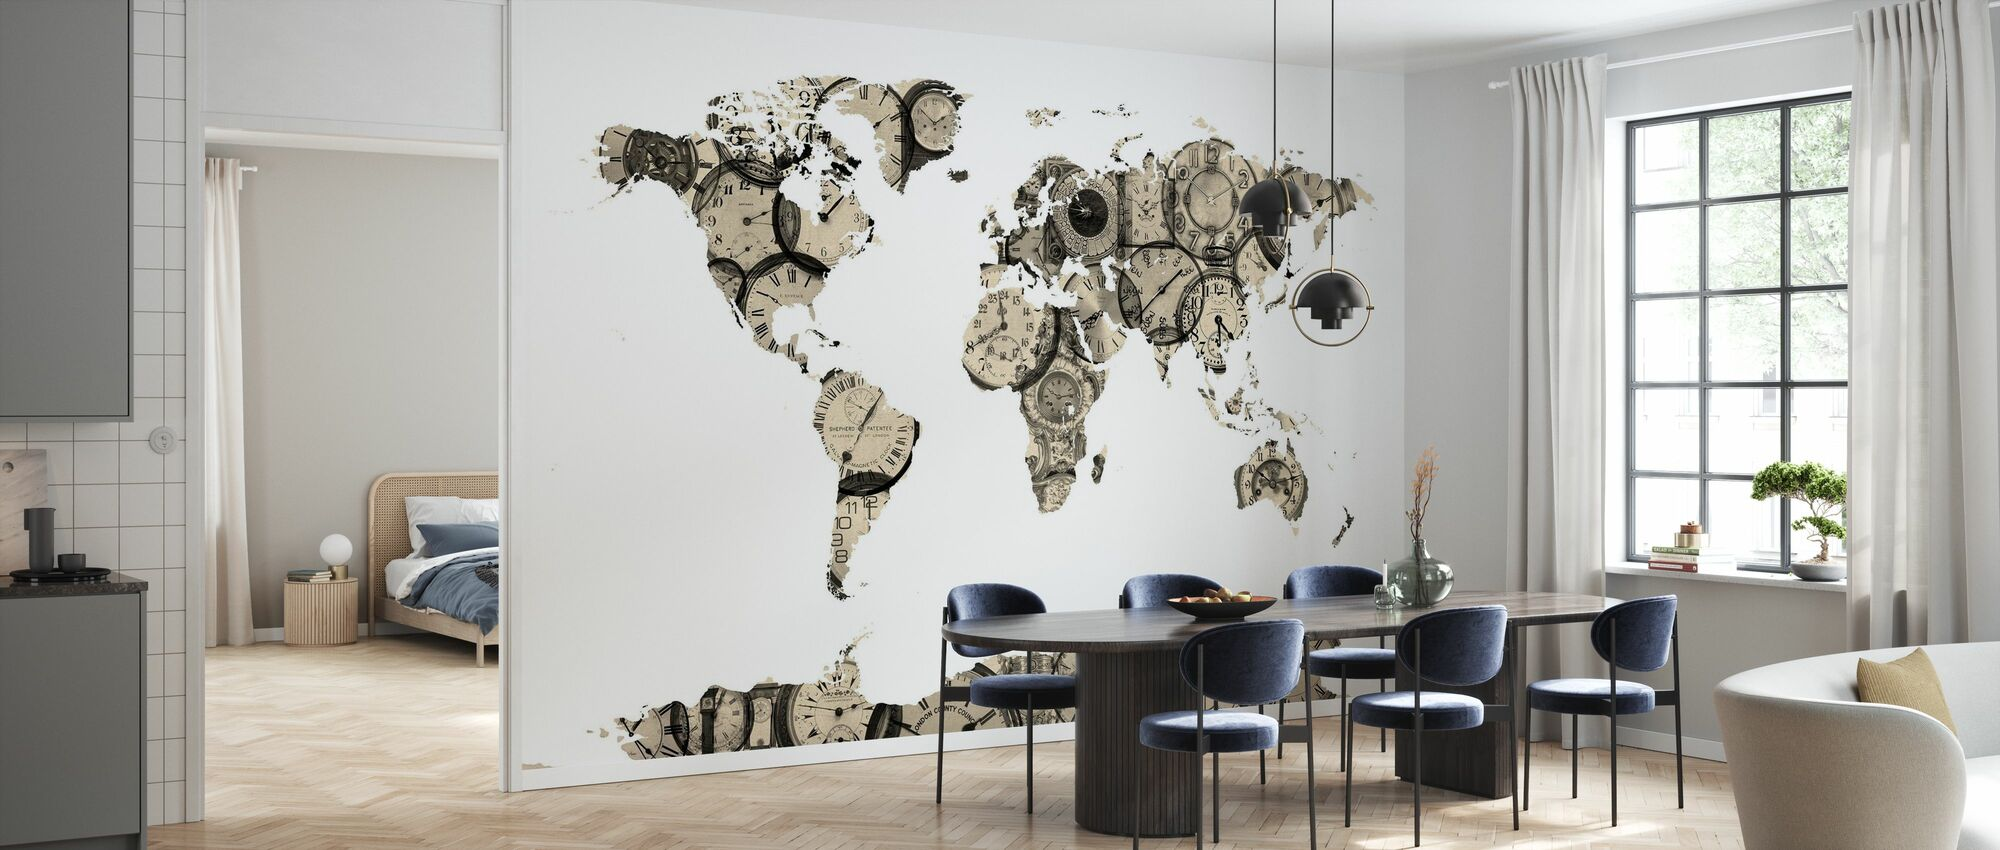 Old Clocks World Map - Papel pintado - Cocina